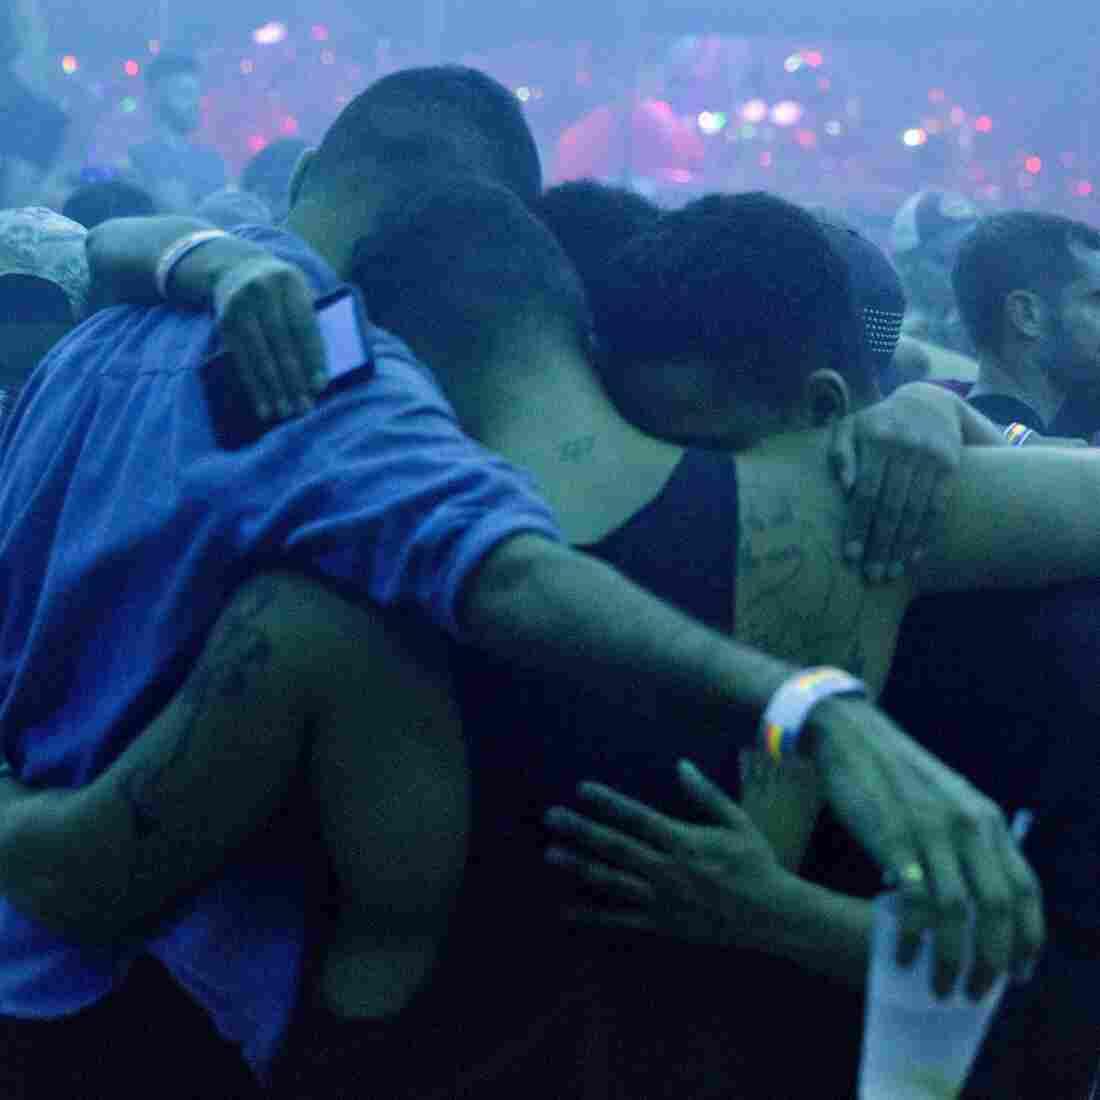 Orlando Nightclub Shooting Bodies: Orlando Shooting: What Happened At The Pulse Nightclub